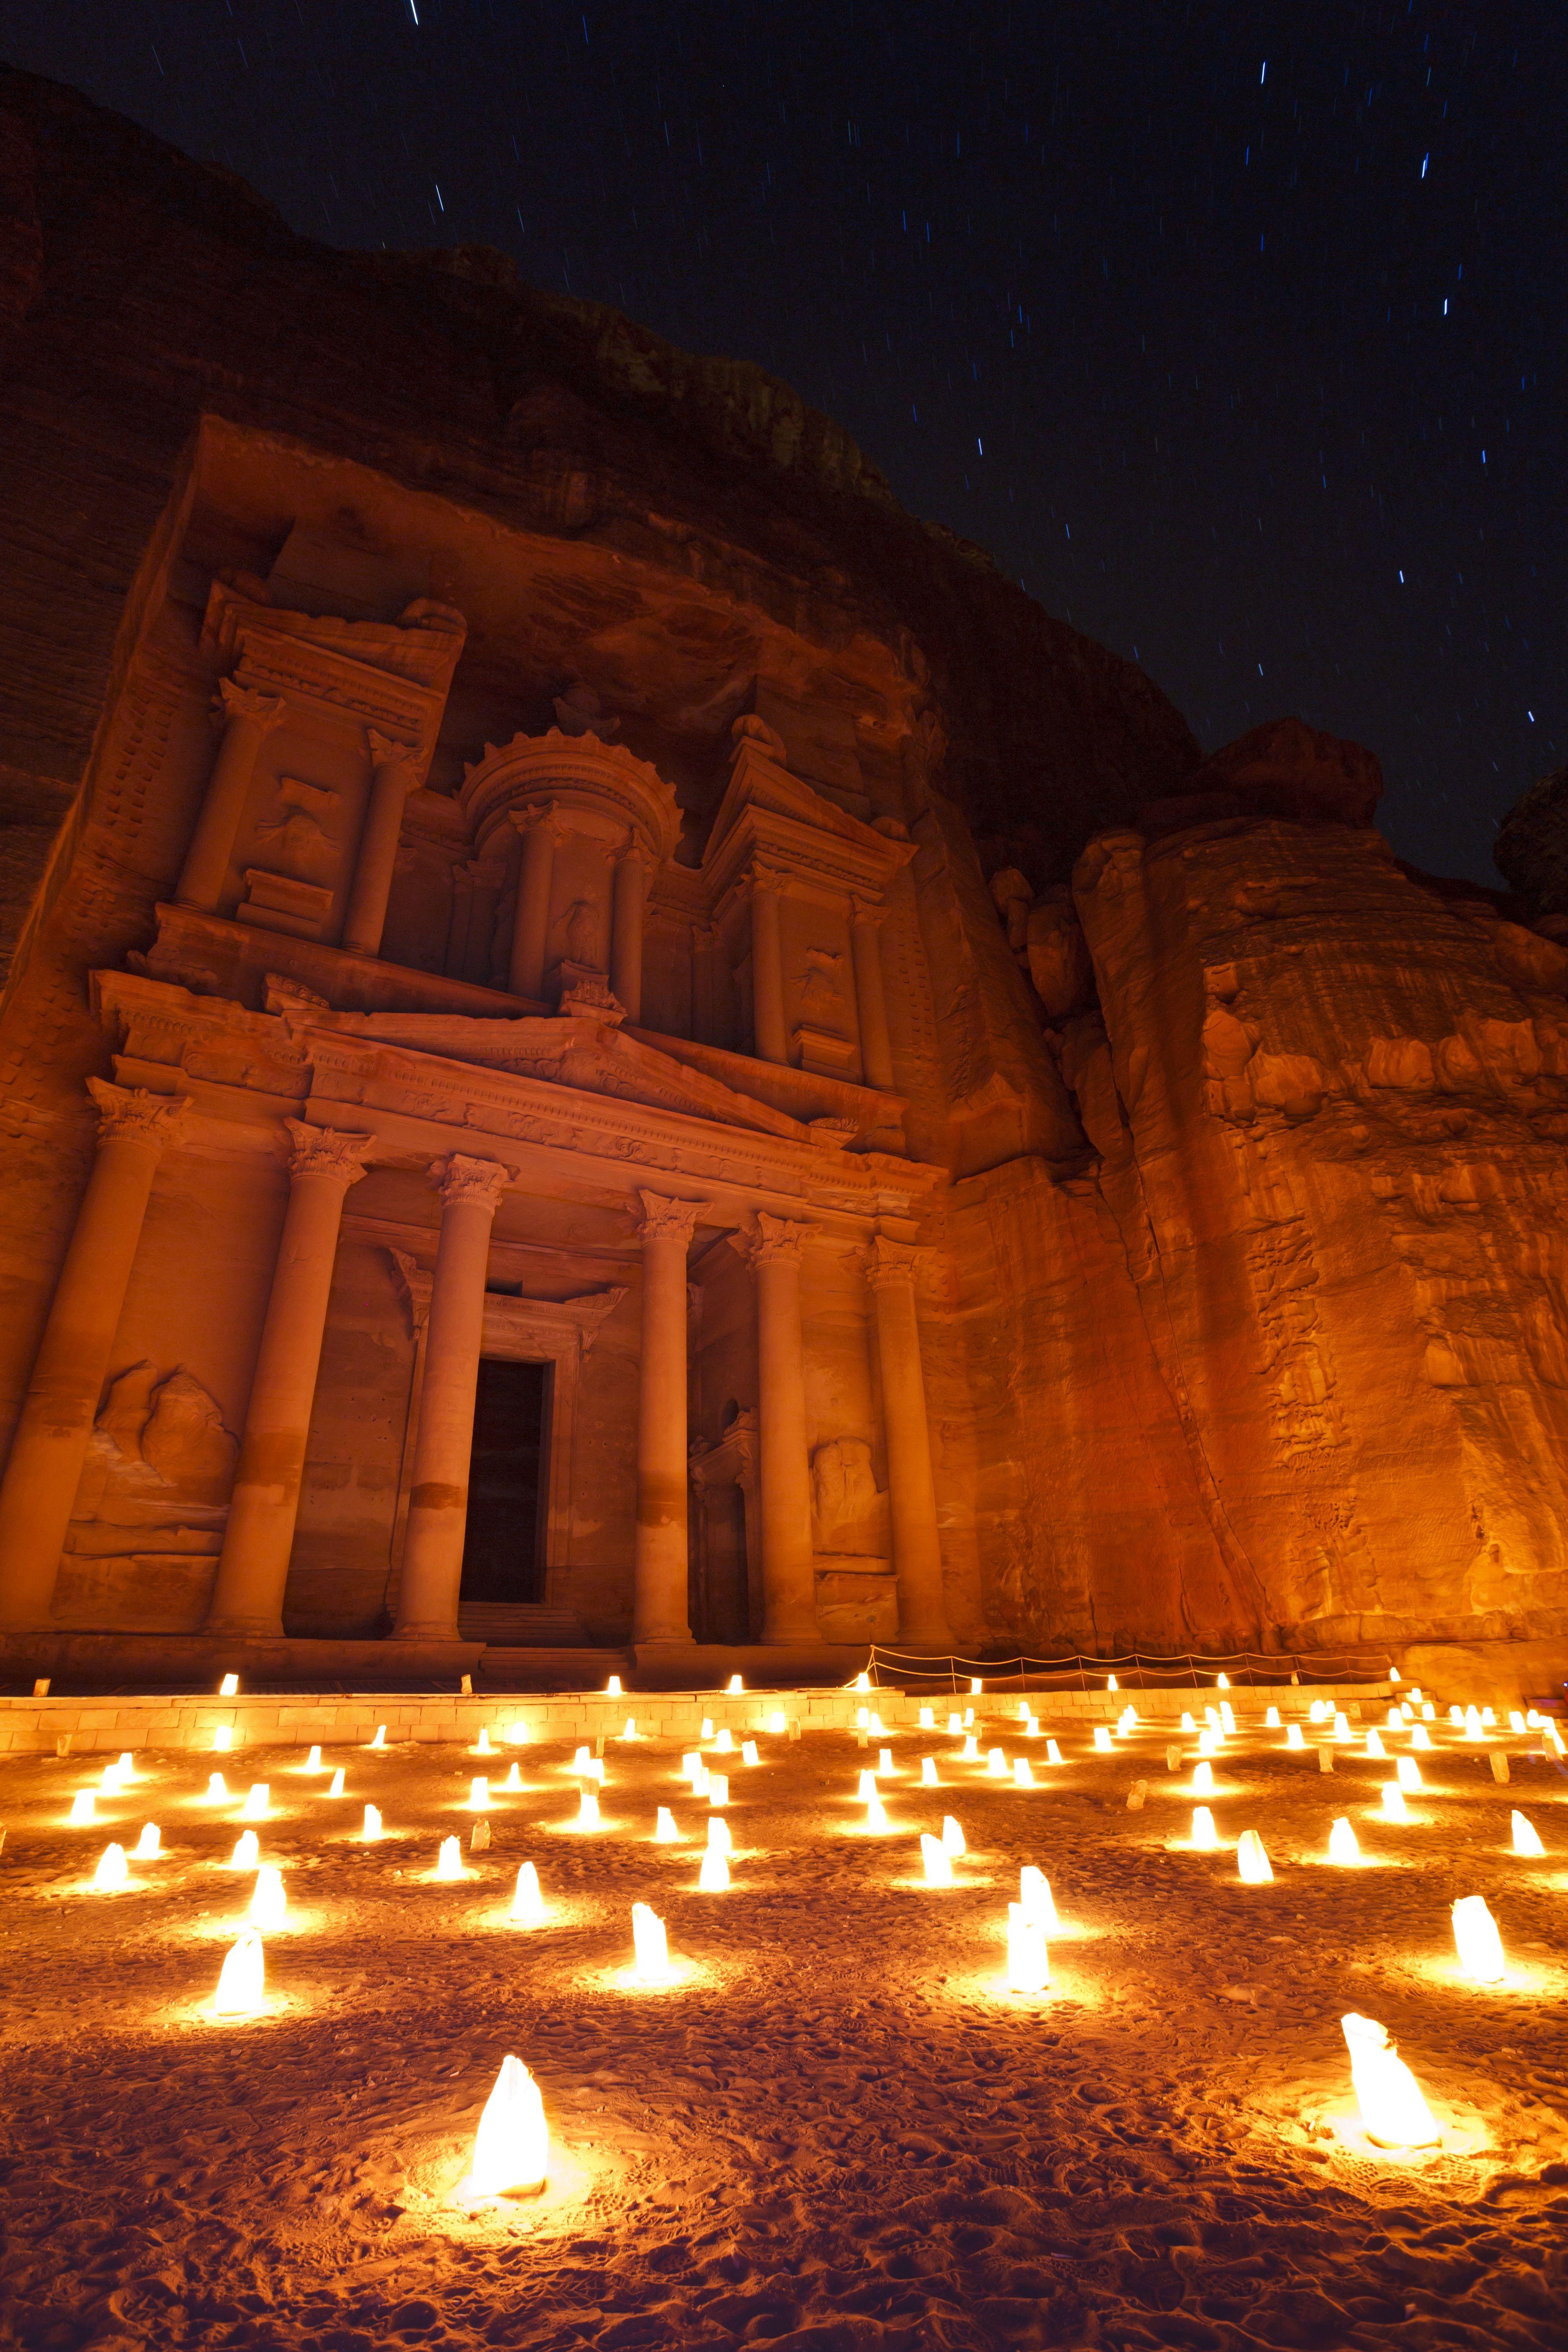 The Treasury at Petra, illuminated at night by the light of 1,800 candles